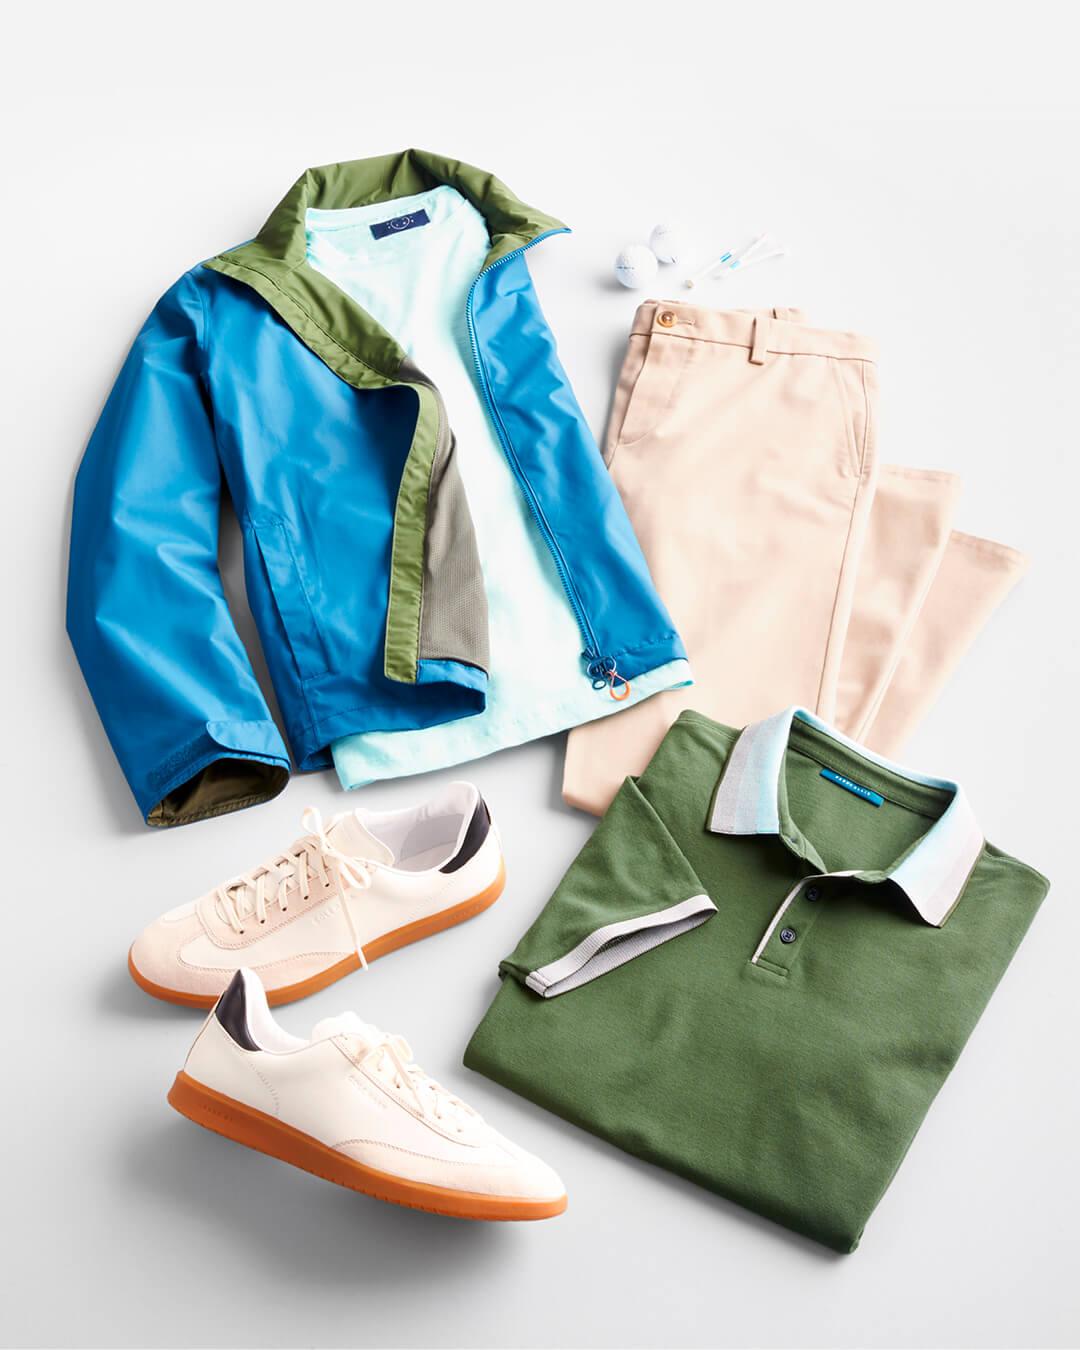 polo, chinos and rain jacket